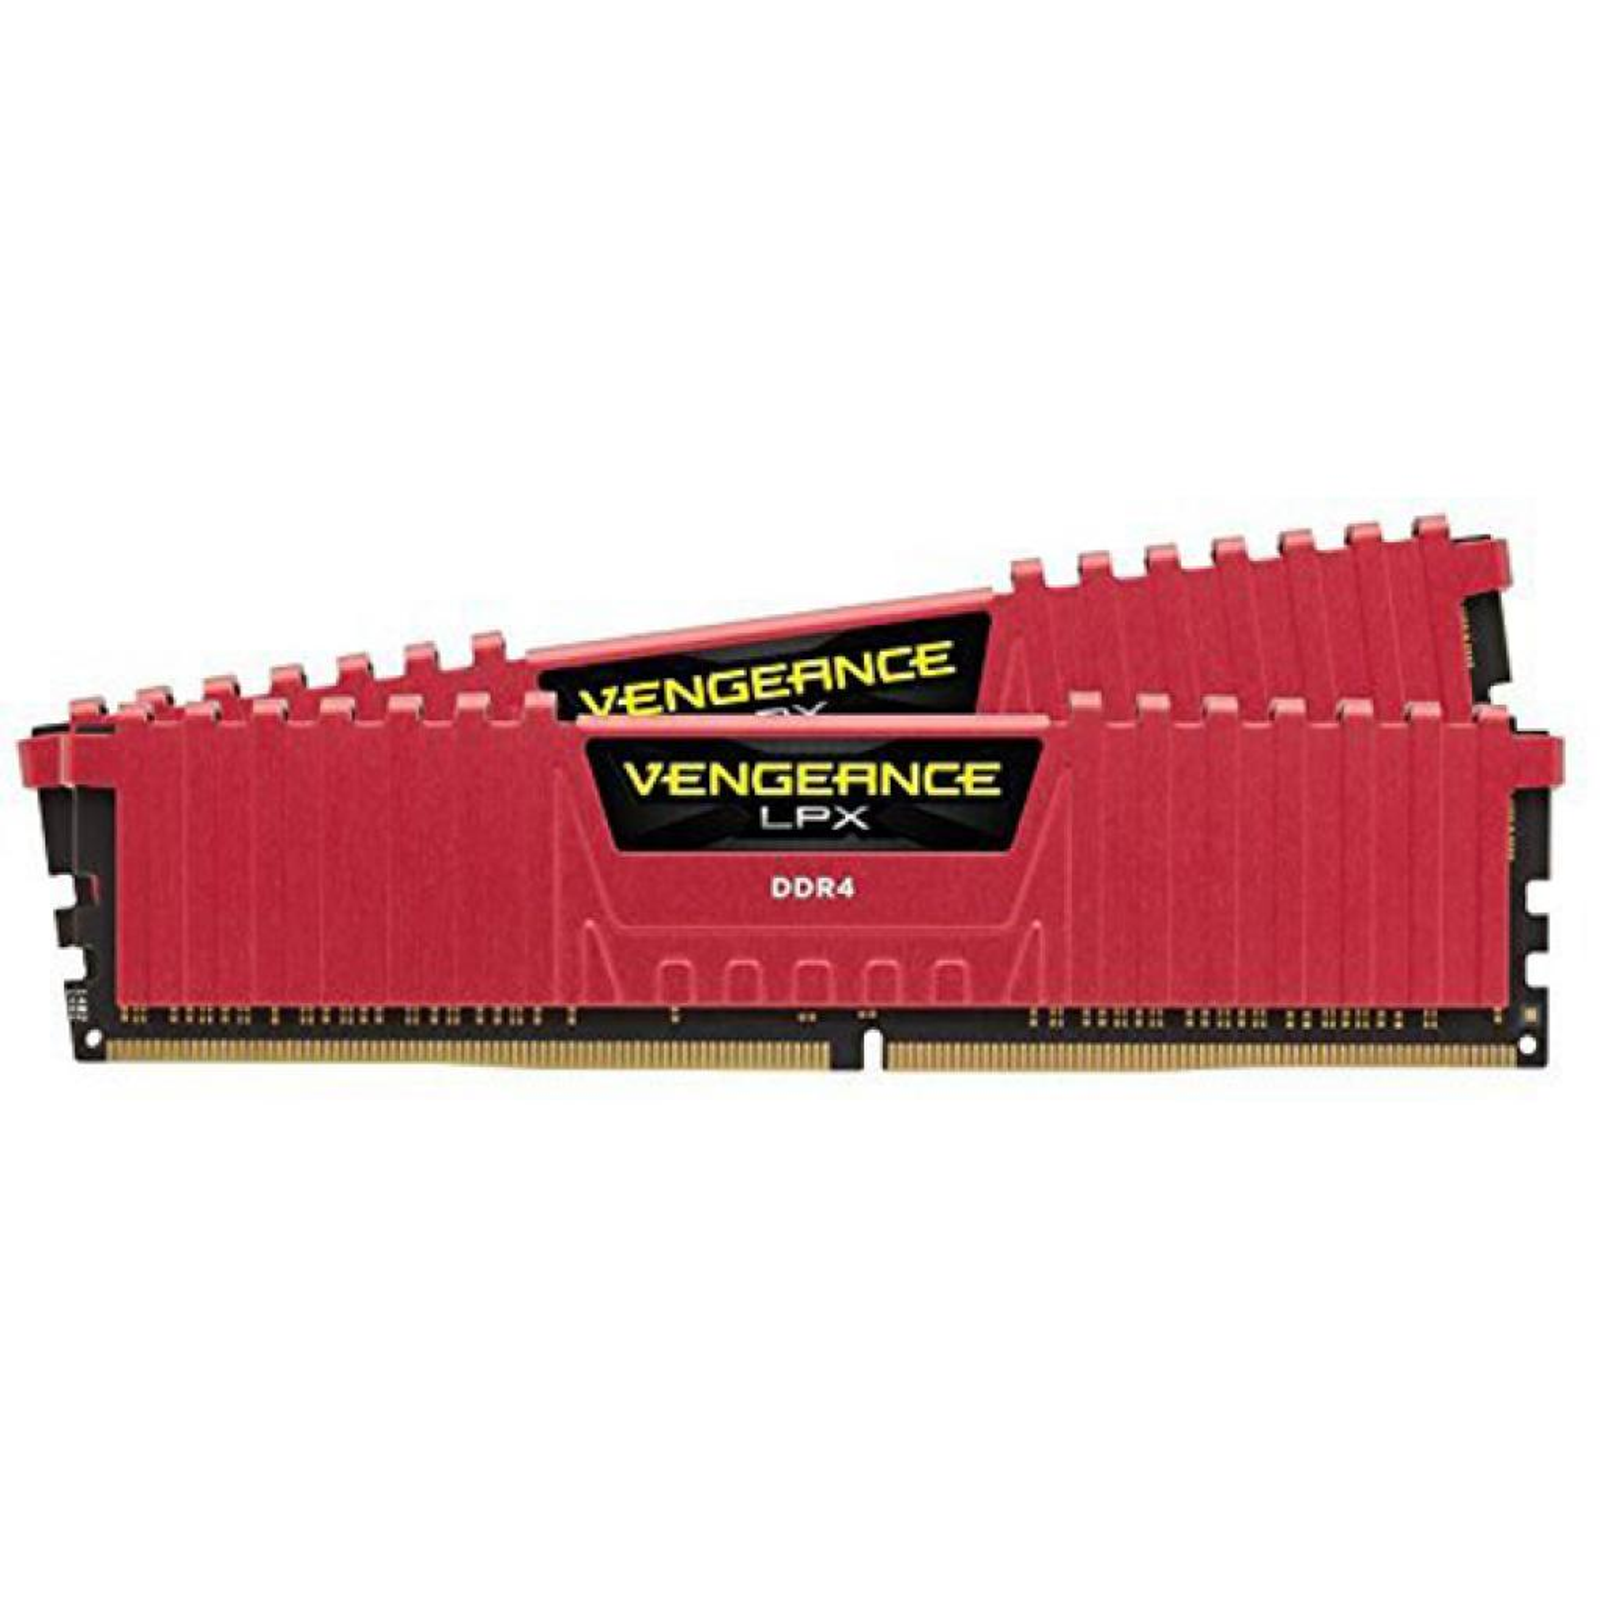 Модуль памяти для компьютера DDR4 16GB (2x8GB) 3200 MHz Vengeance LPX Red CORSAIR (CMK16GX4M2B3200C16R) изображение 2